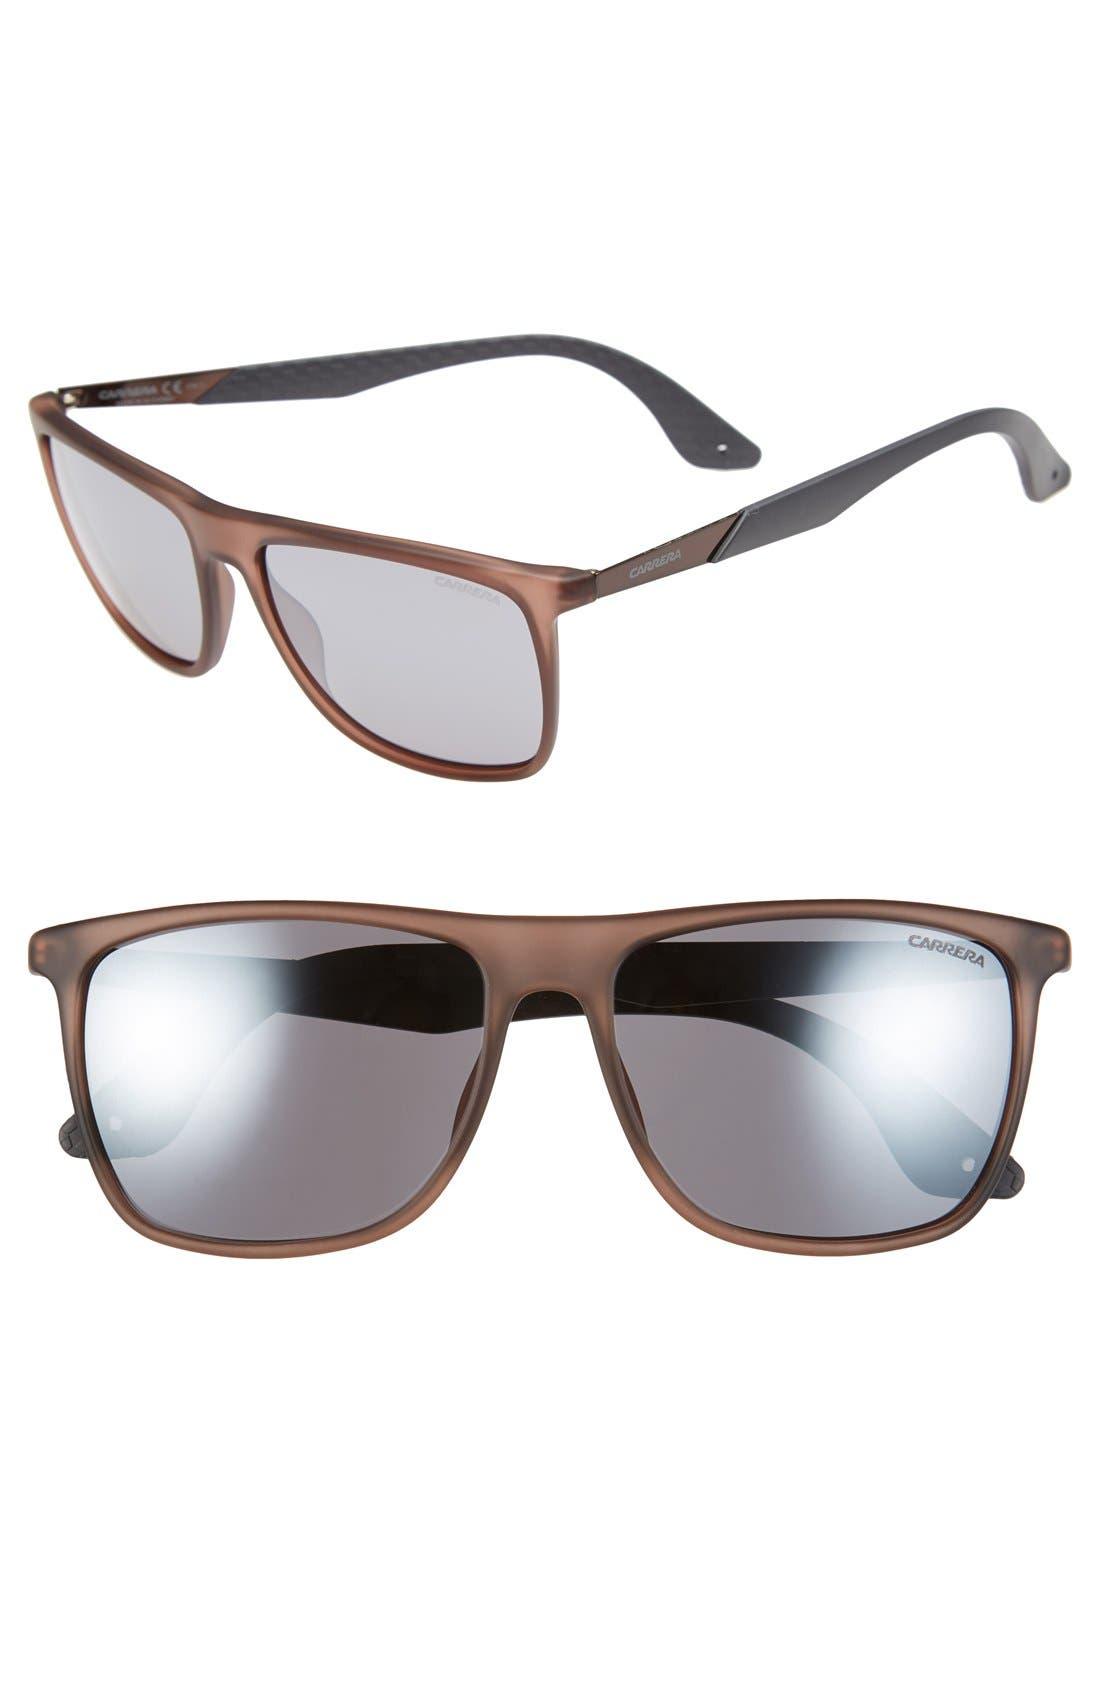 Alternate Image 1 Selected - Carrera Eyewear 56mm Retro Sunglasses